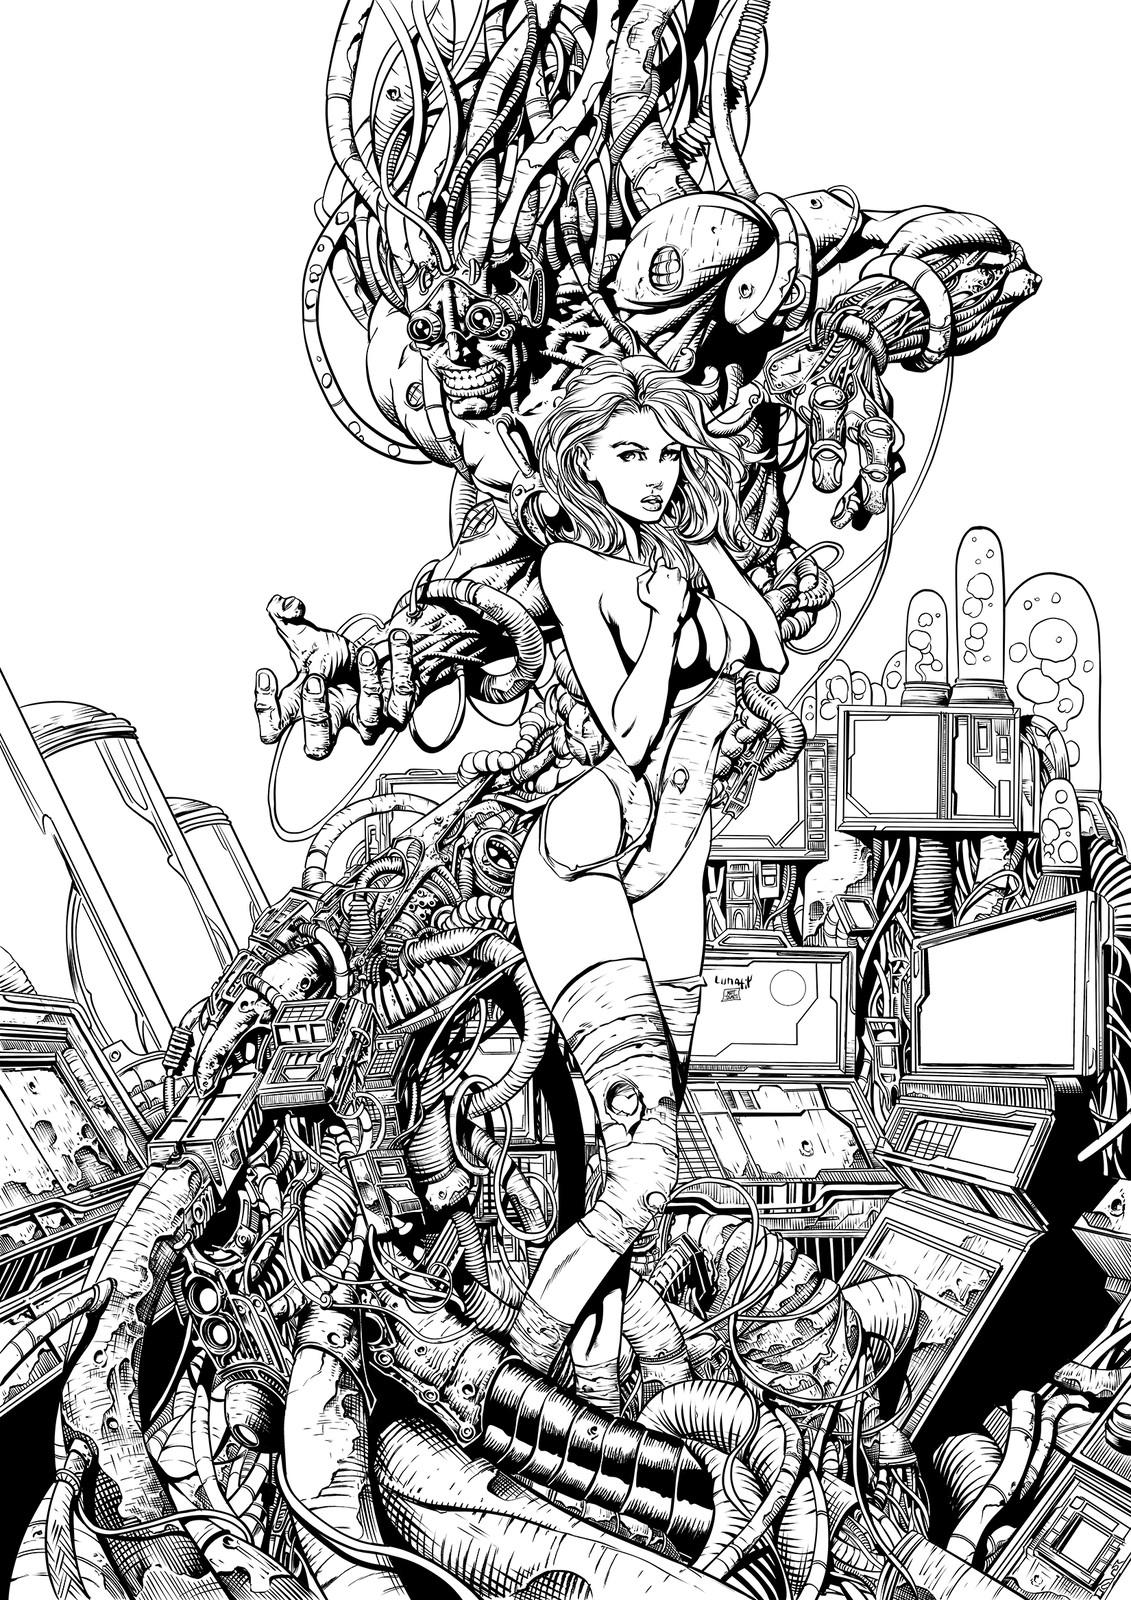 Cyberpunk K.R.I.G.A.Z.